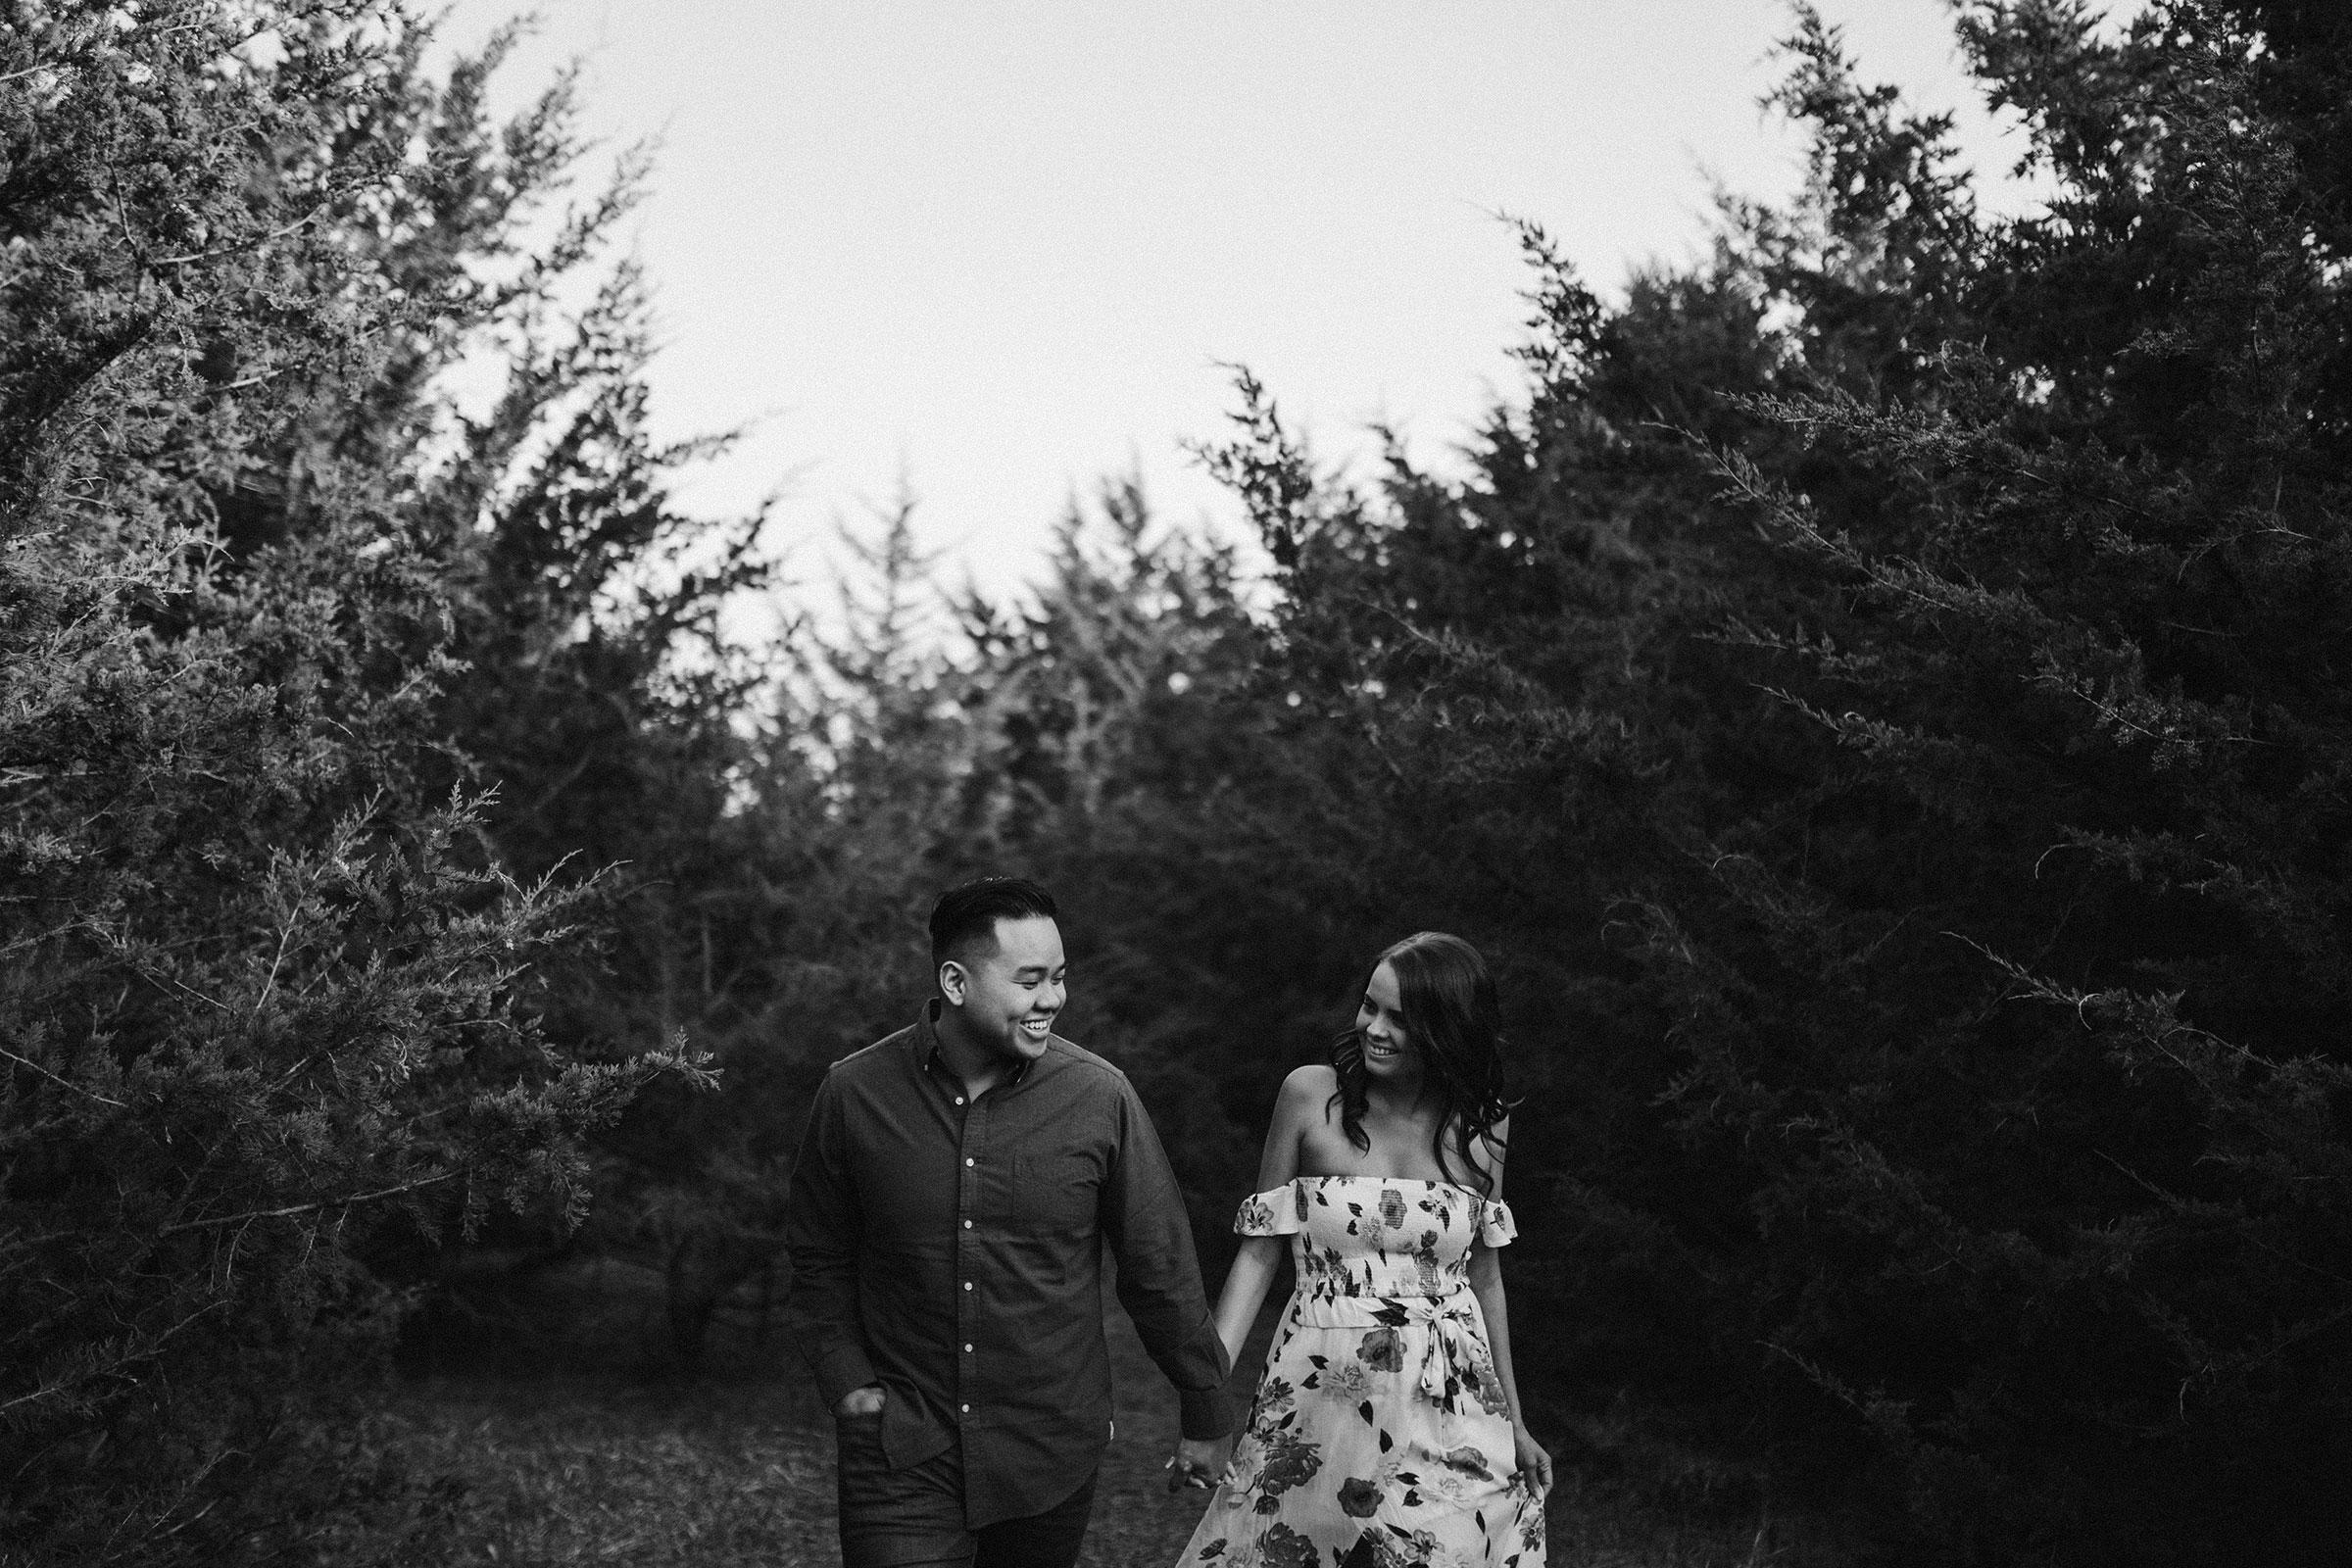 couple-walking-through-trees-iris-aisle-winterset-iowa-raelyn-ramey-photography.jpg